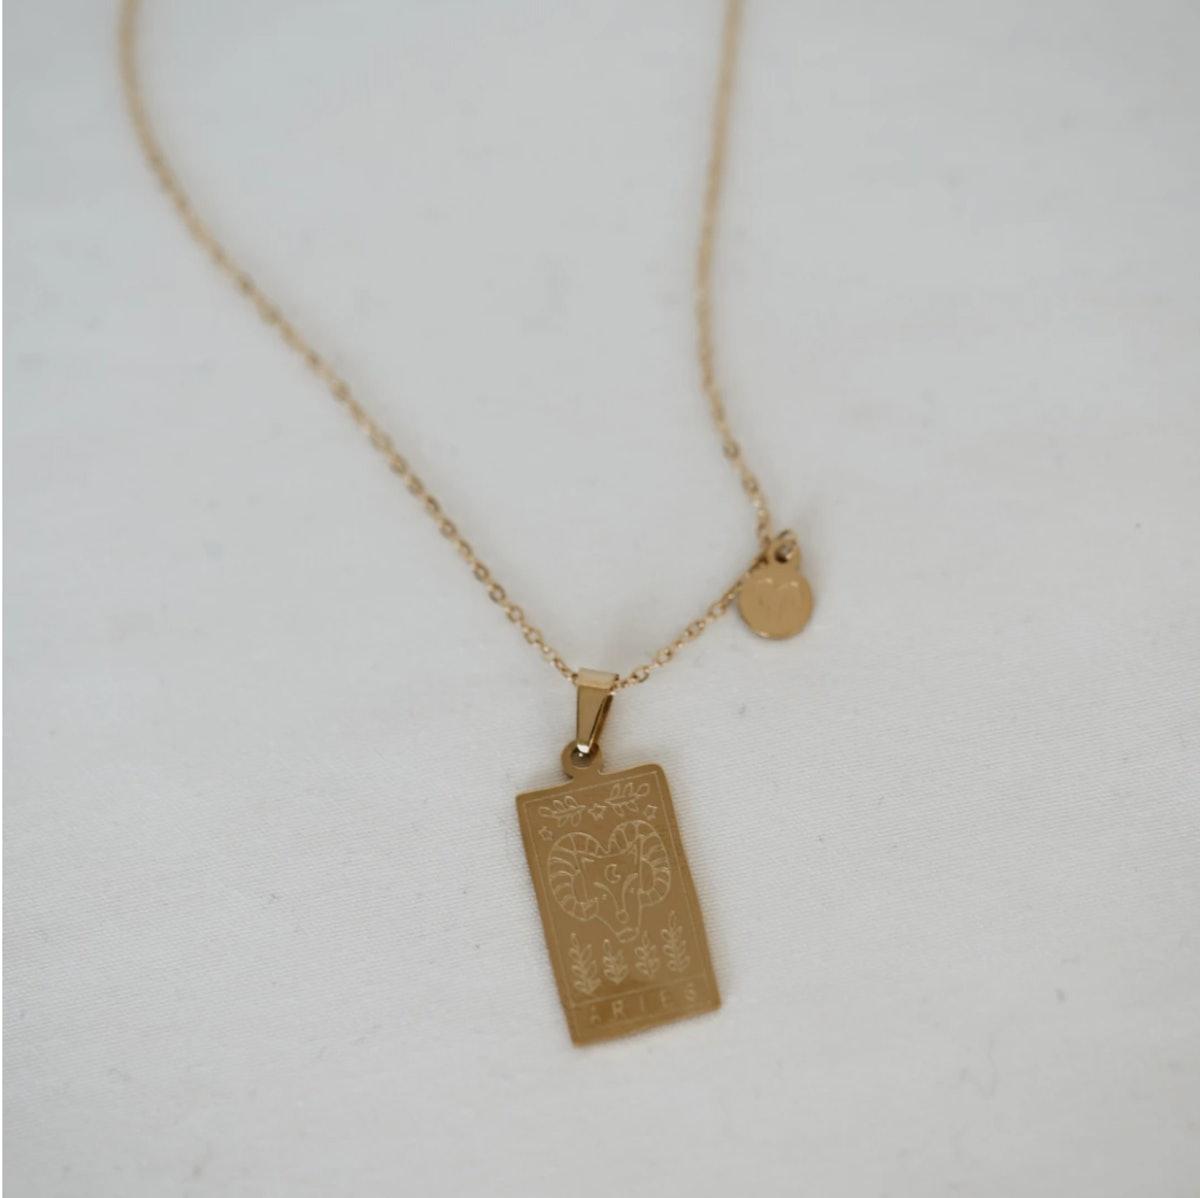 Stella & Haas' zodiac card necklace.